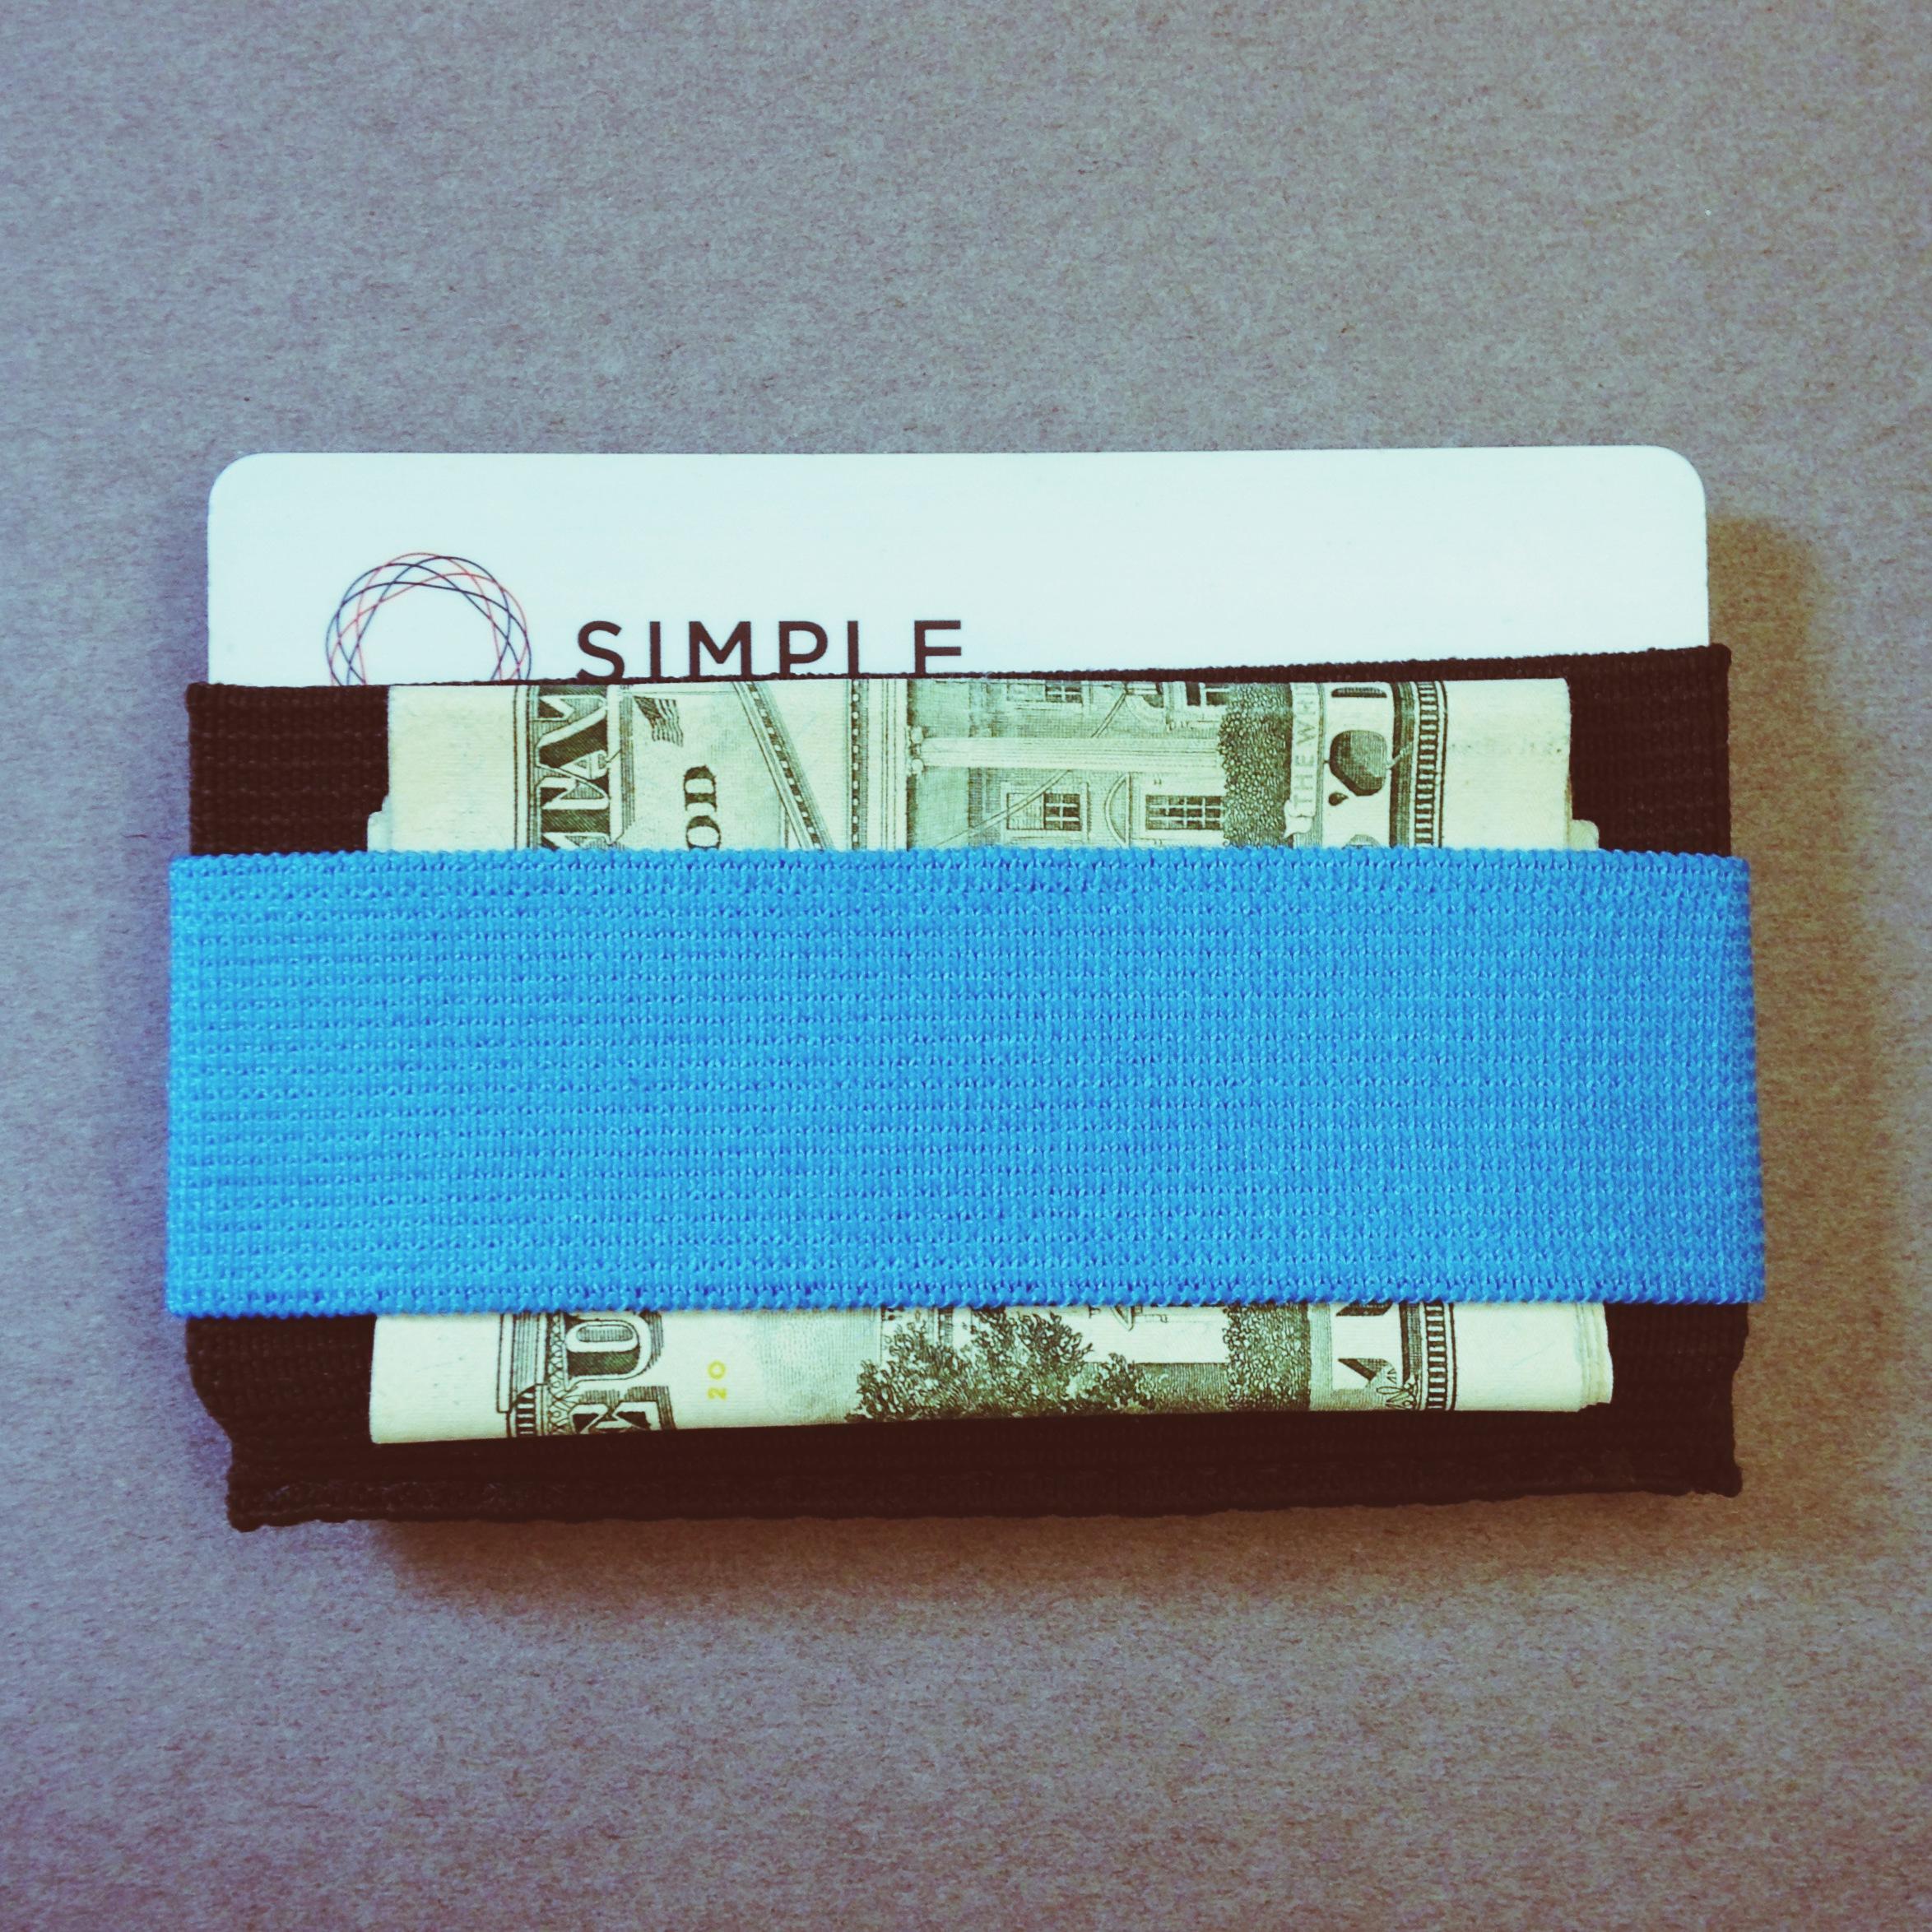 Snapback Slim gray with simple.jpg